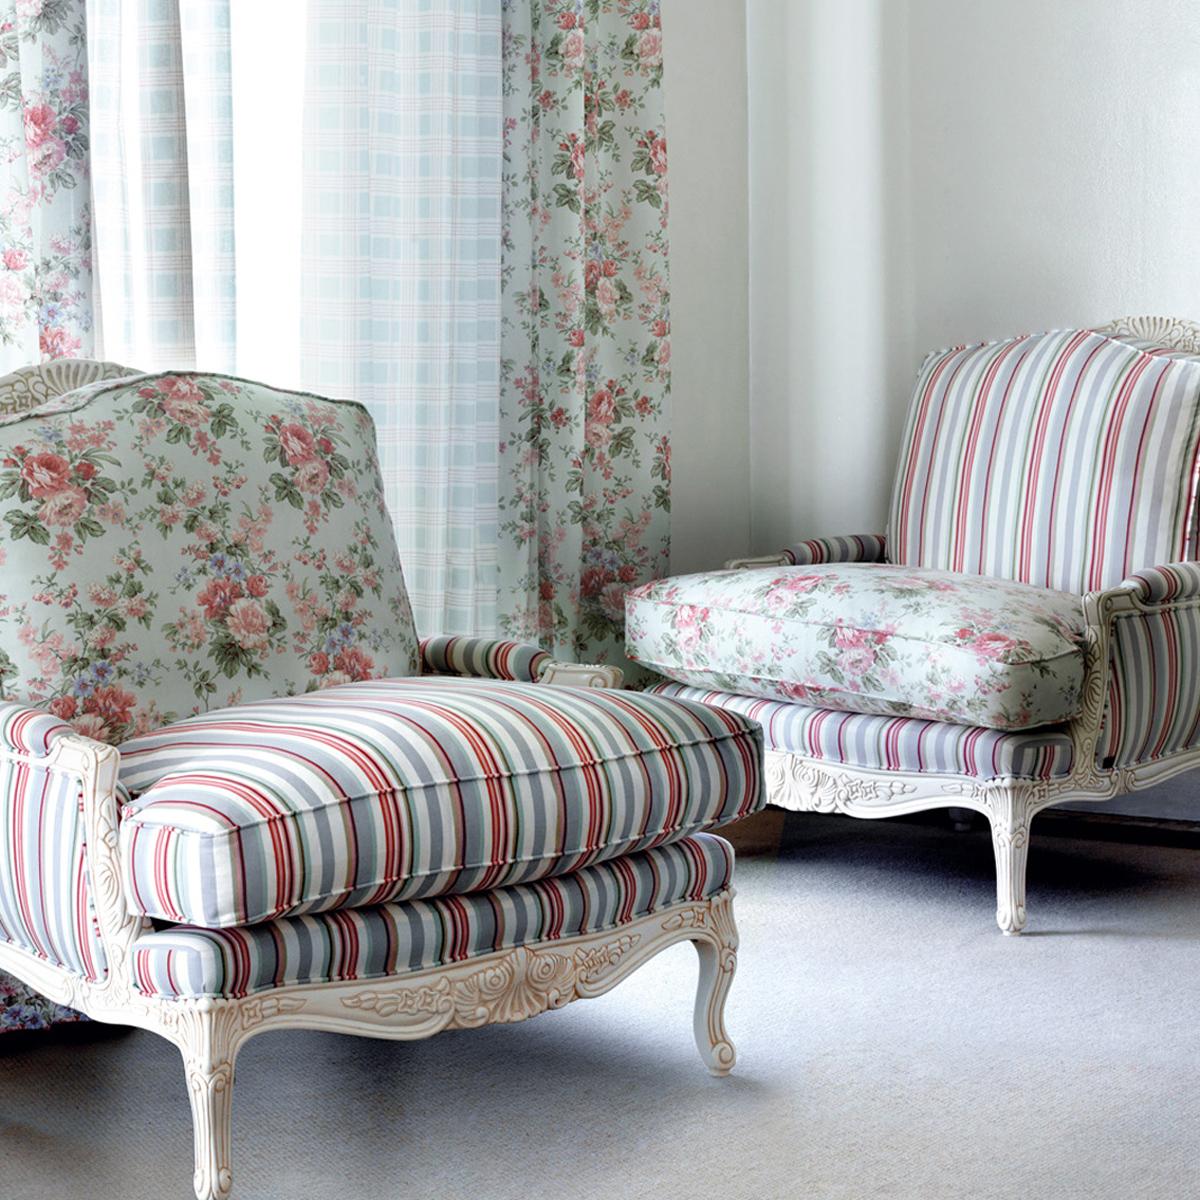 Telas estampadas car interior design - Telas para tapizar muebles ...